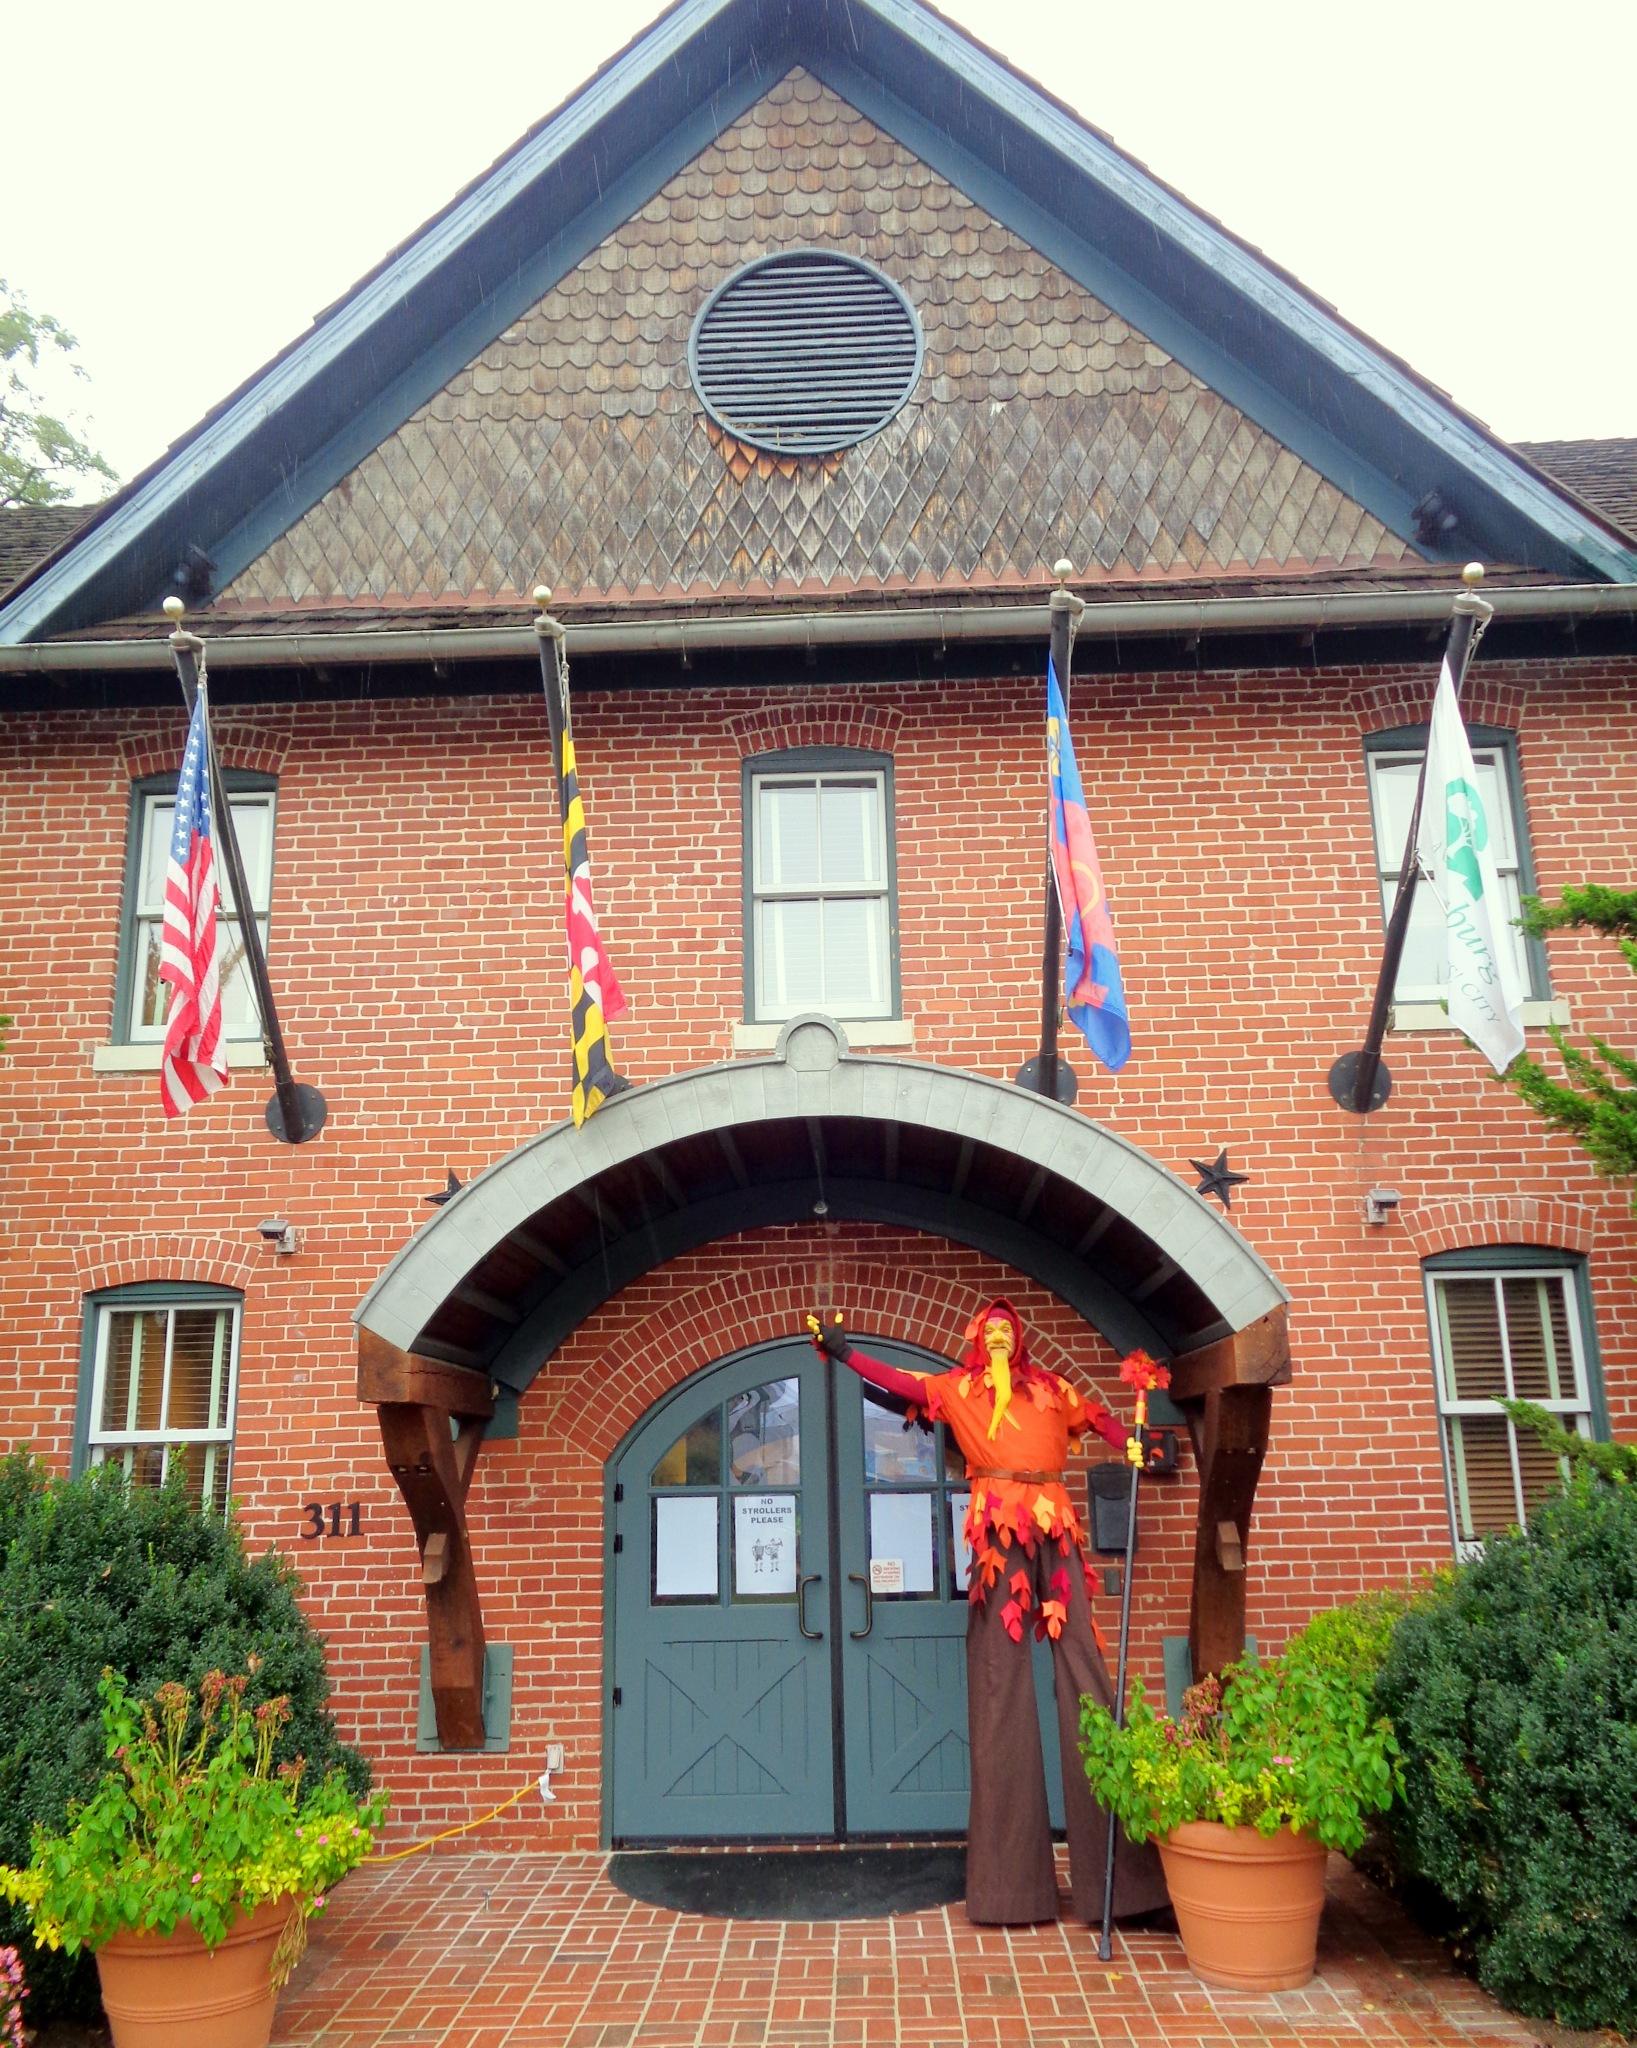 City of Gaithersburg 26th Annual Oktoberfest in Kentlands on Sunday October 8, 2017 by NatalyaParris